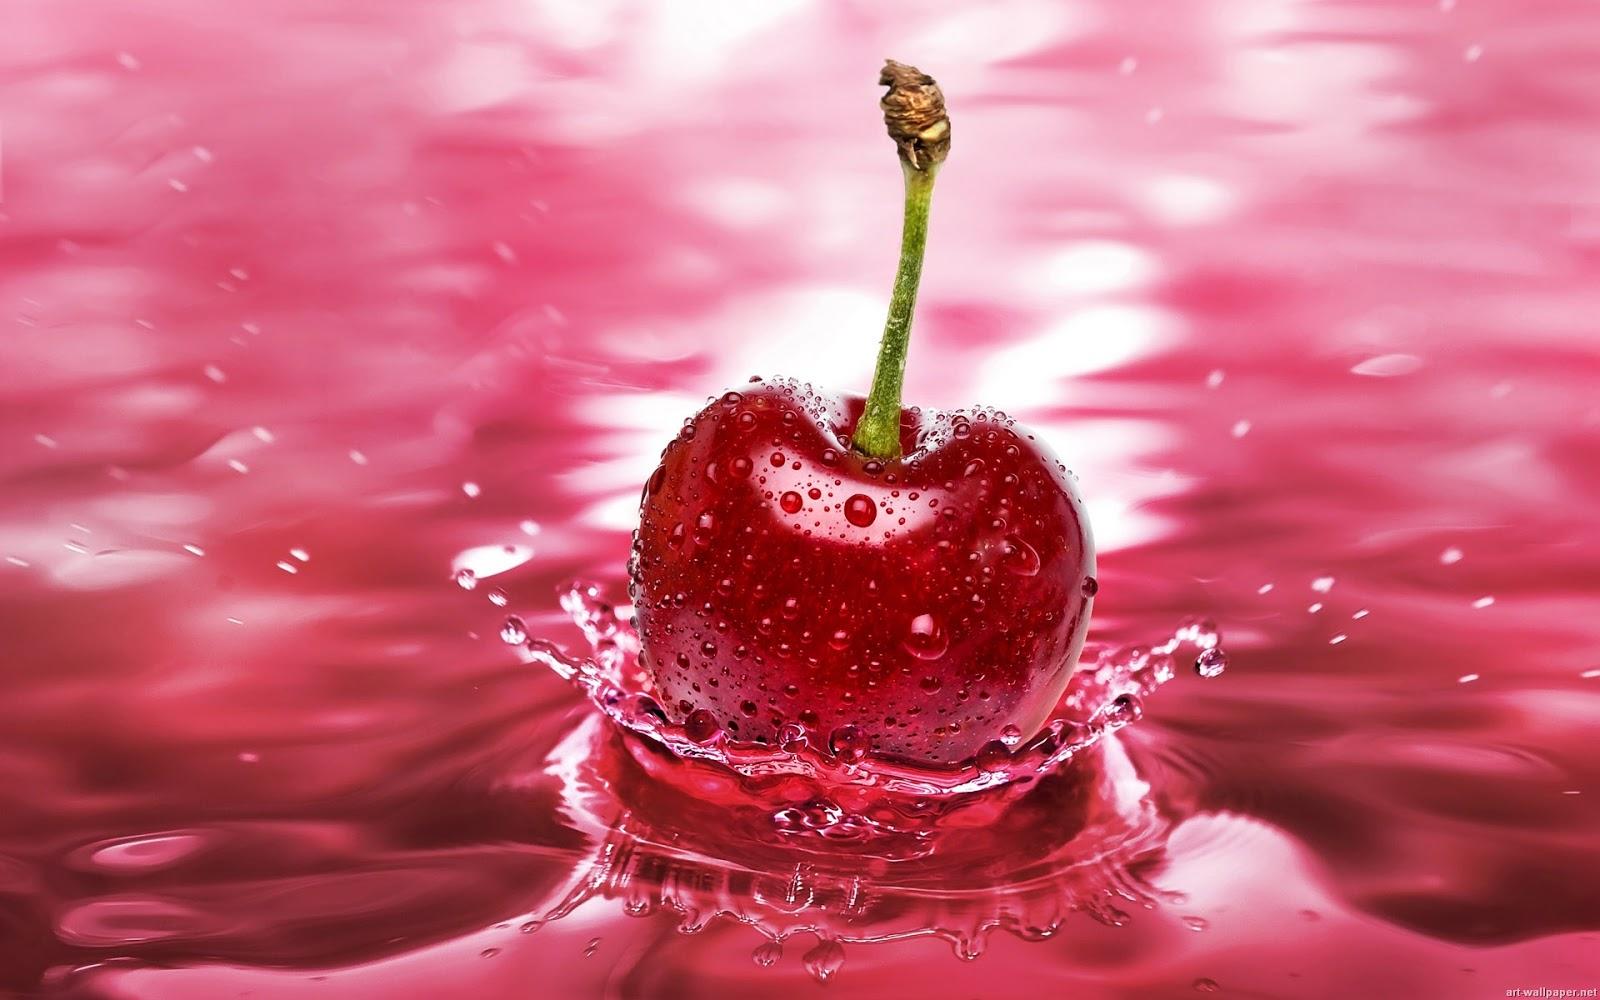 Fresh Berry 1080 HD Wallpaper for Desktop Background